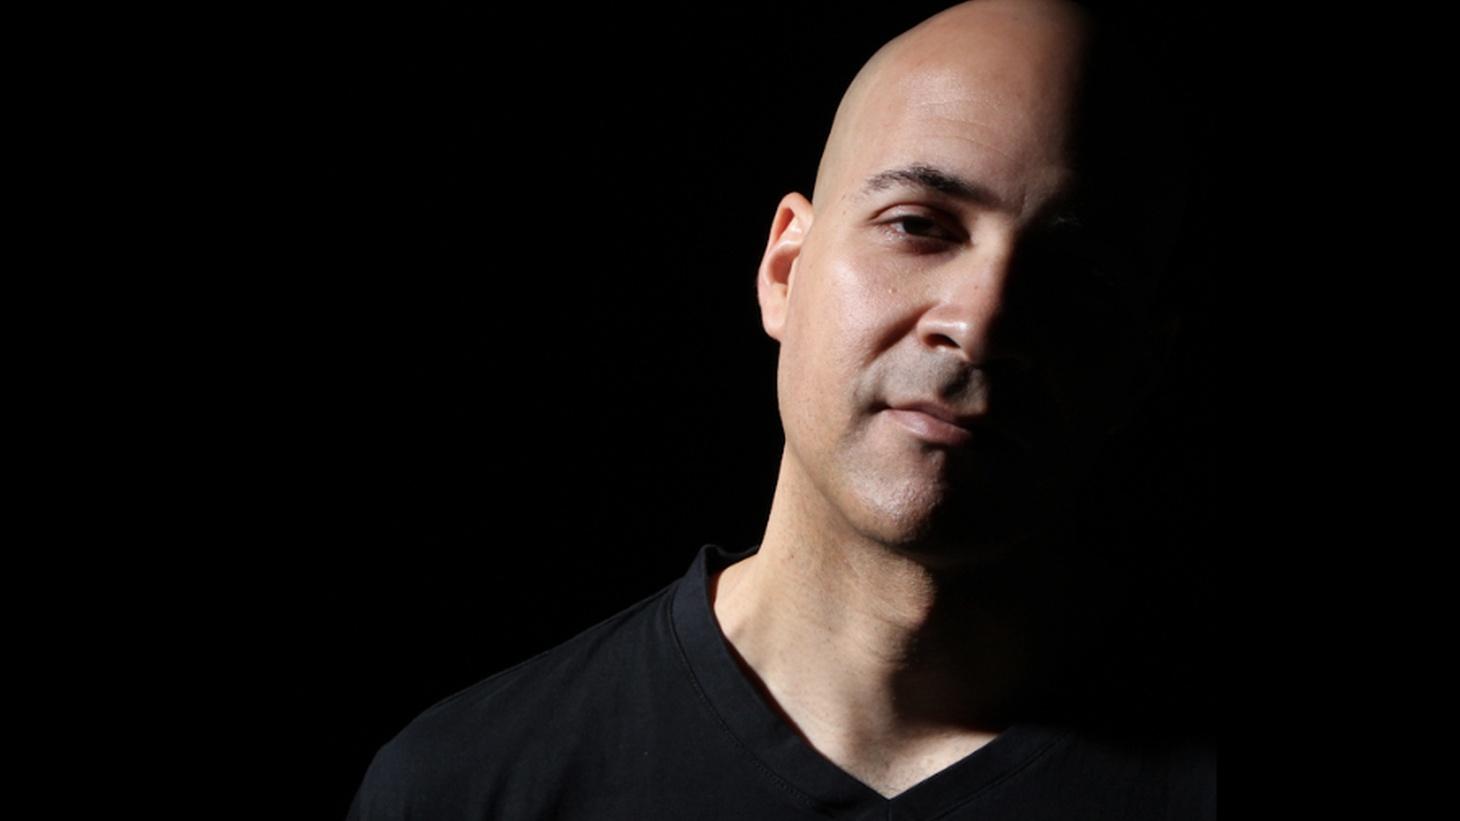 Groundbreaking spoken word artist, Saul Williams, will be guest DJ on Chocolate City.